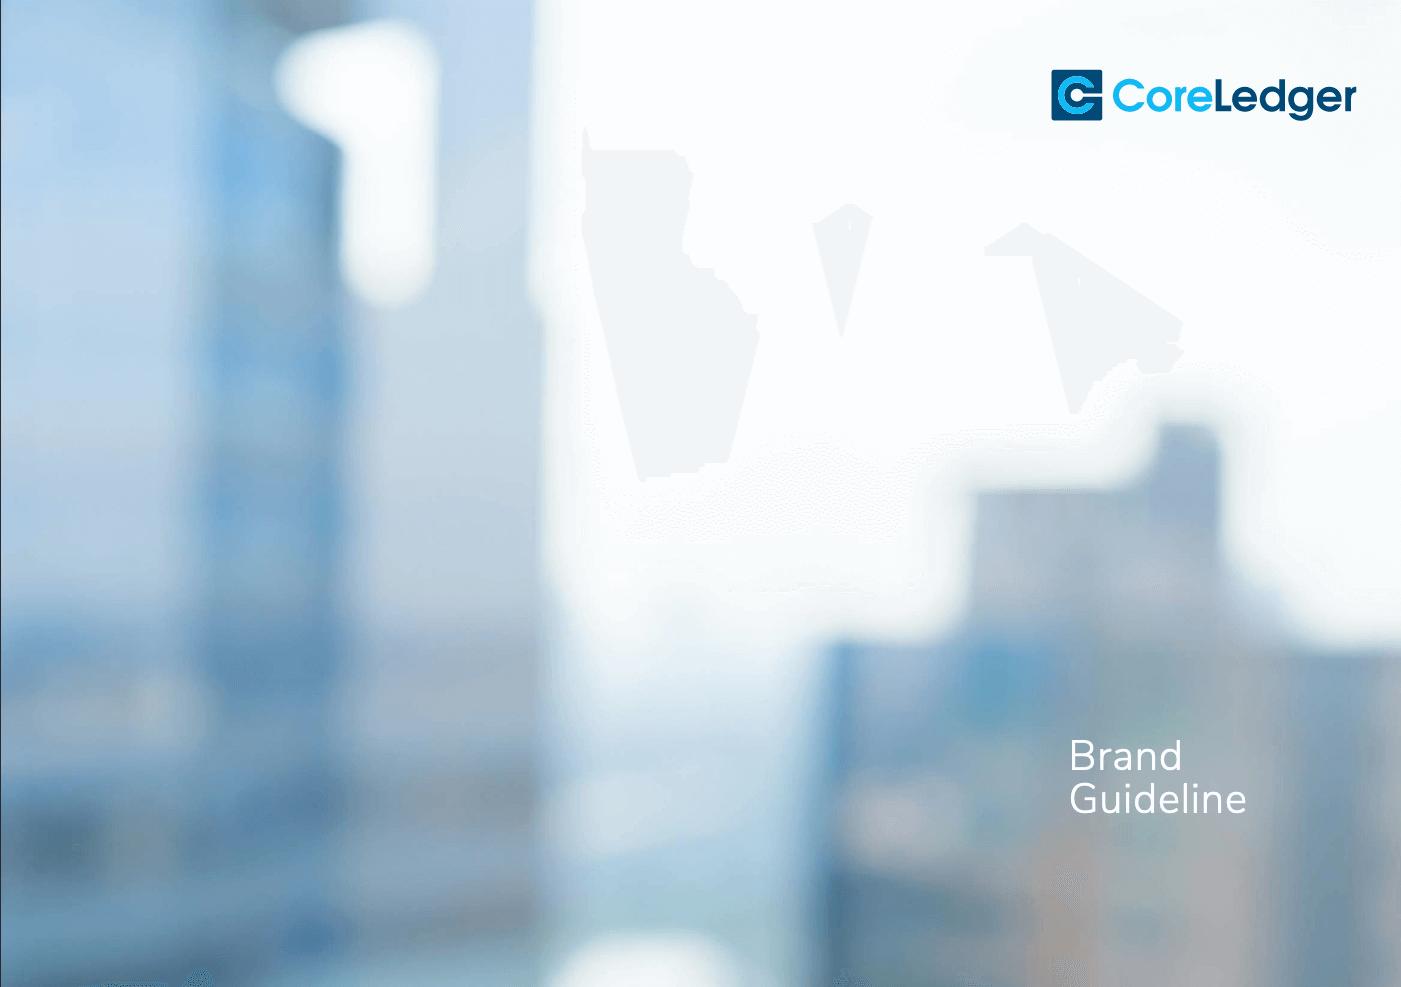 CoreLedger Brand Guidelines